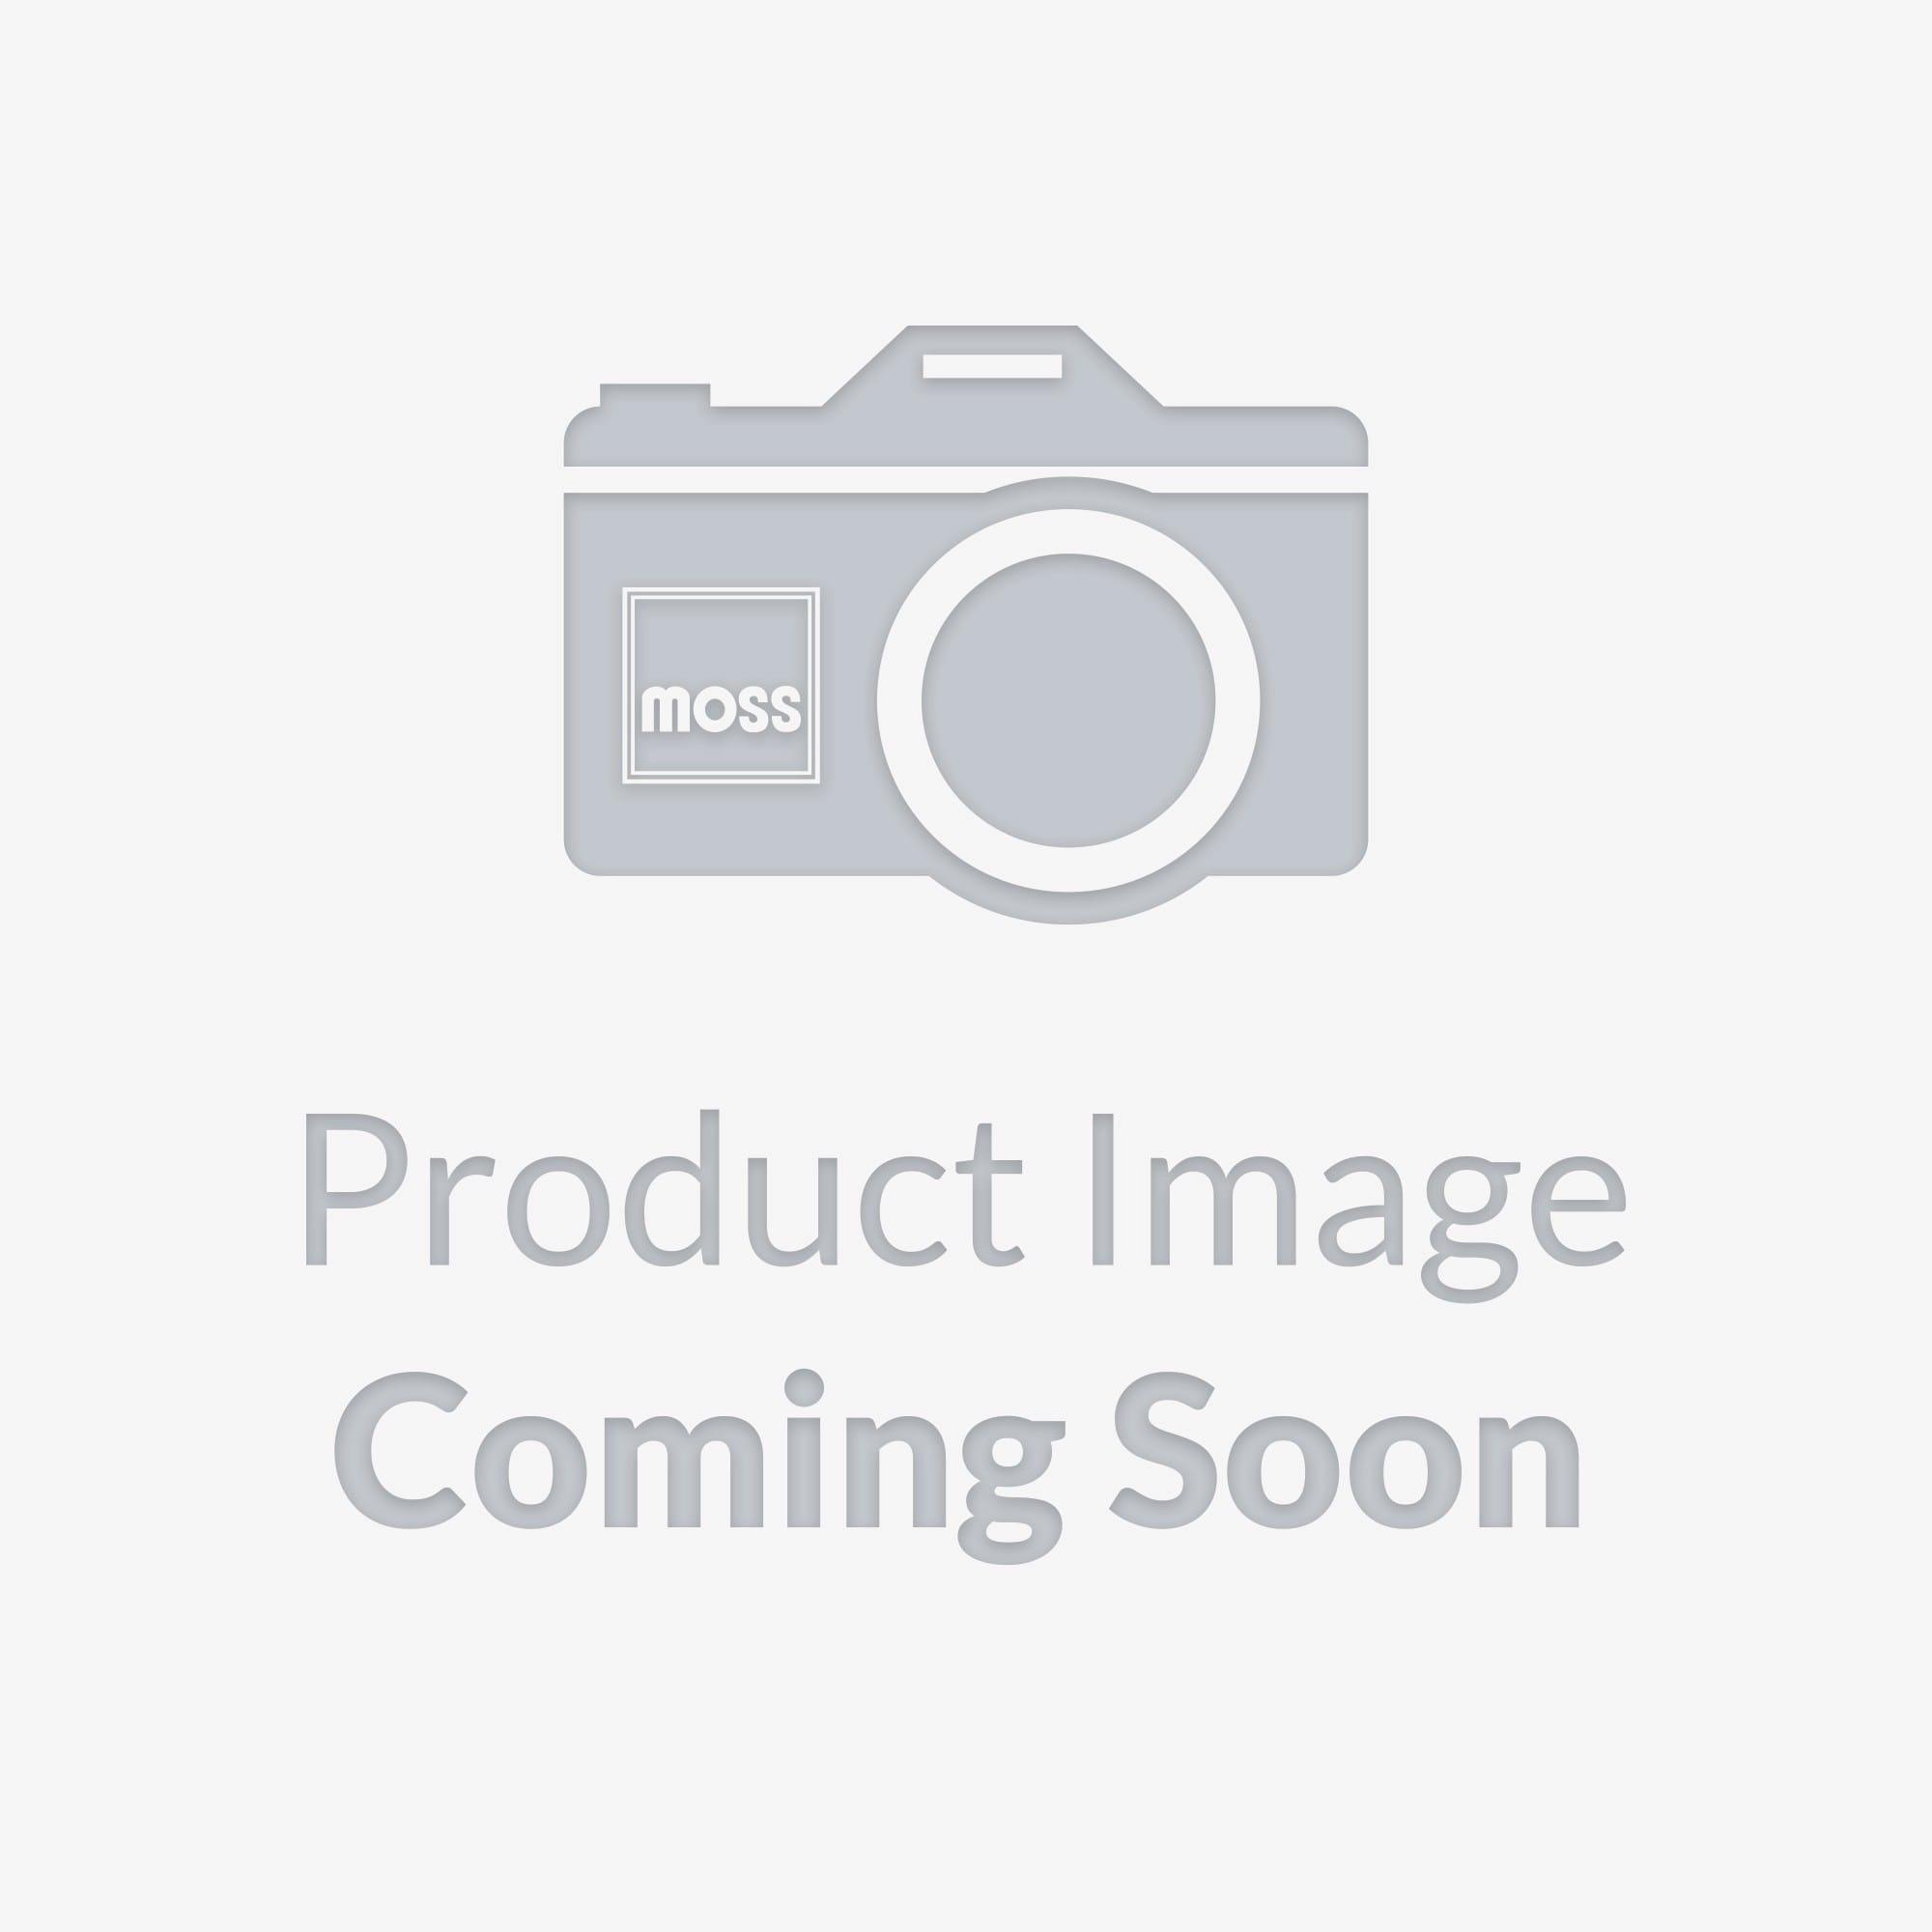 Plush Embroidered Floor Mats - Carpet Kits & Floor Mats ...